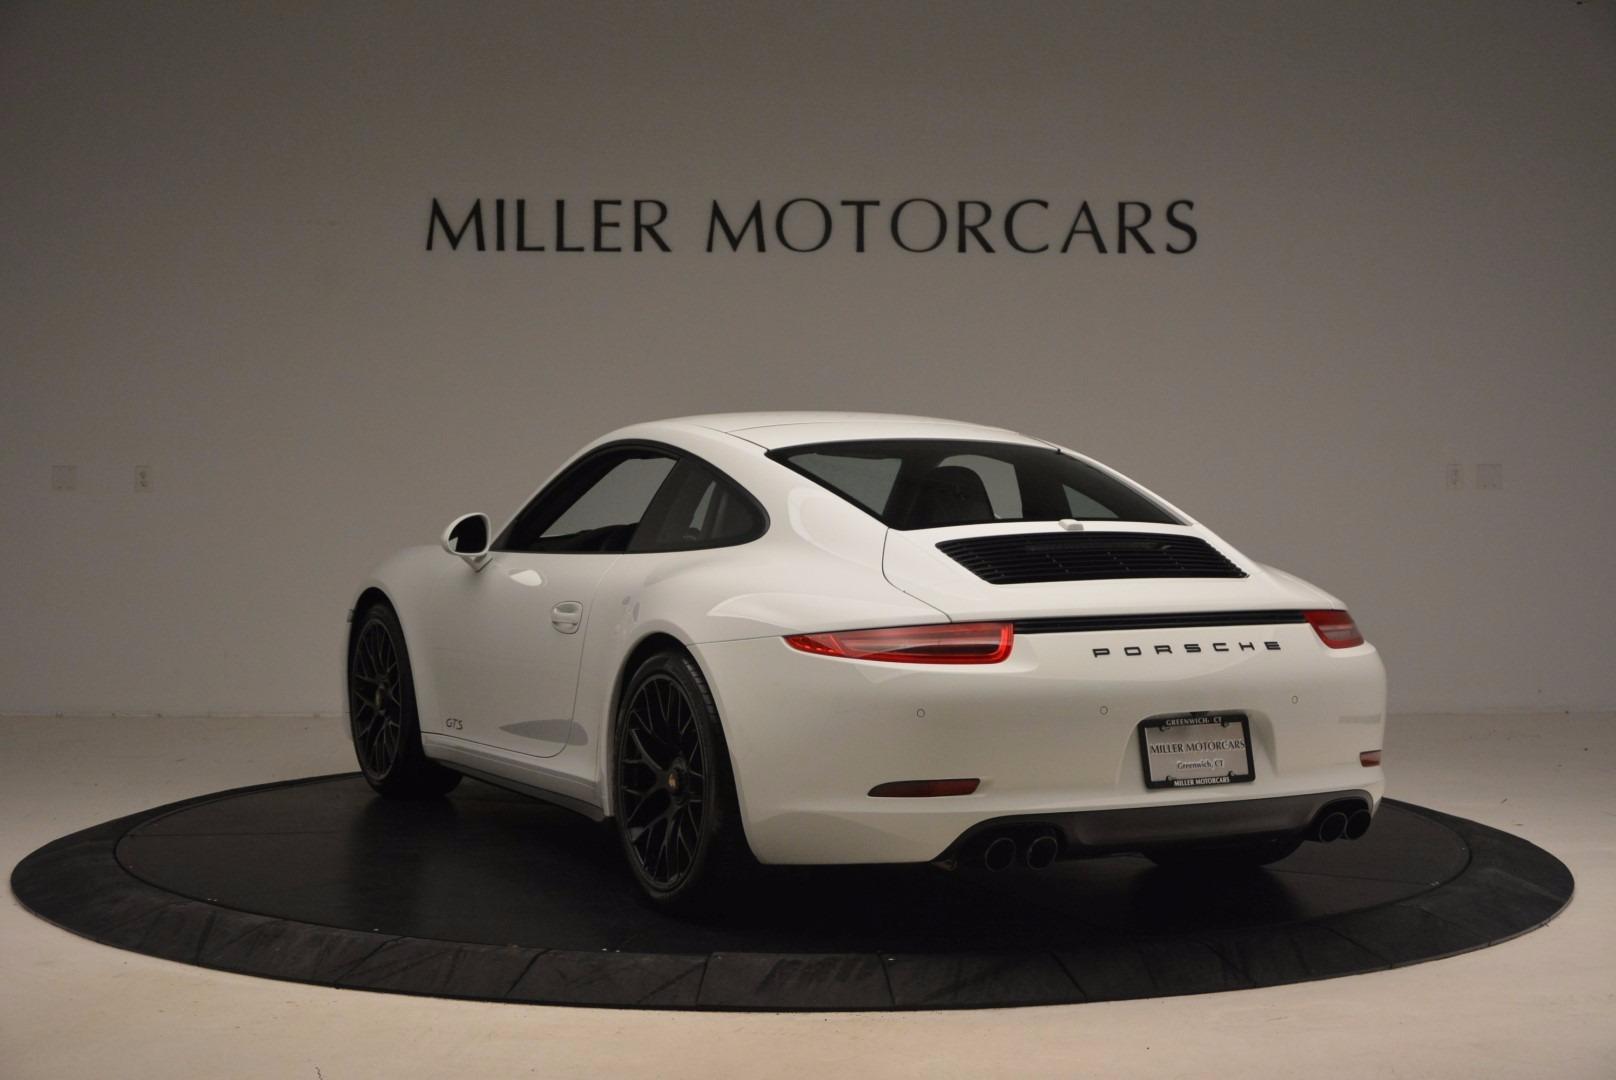 Used 2015 Porsche 911 Carrera GTS For Sale In Greenwich, CT 1444_p5